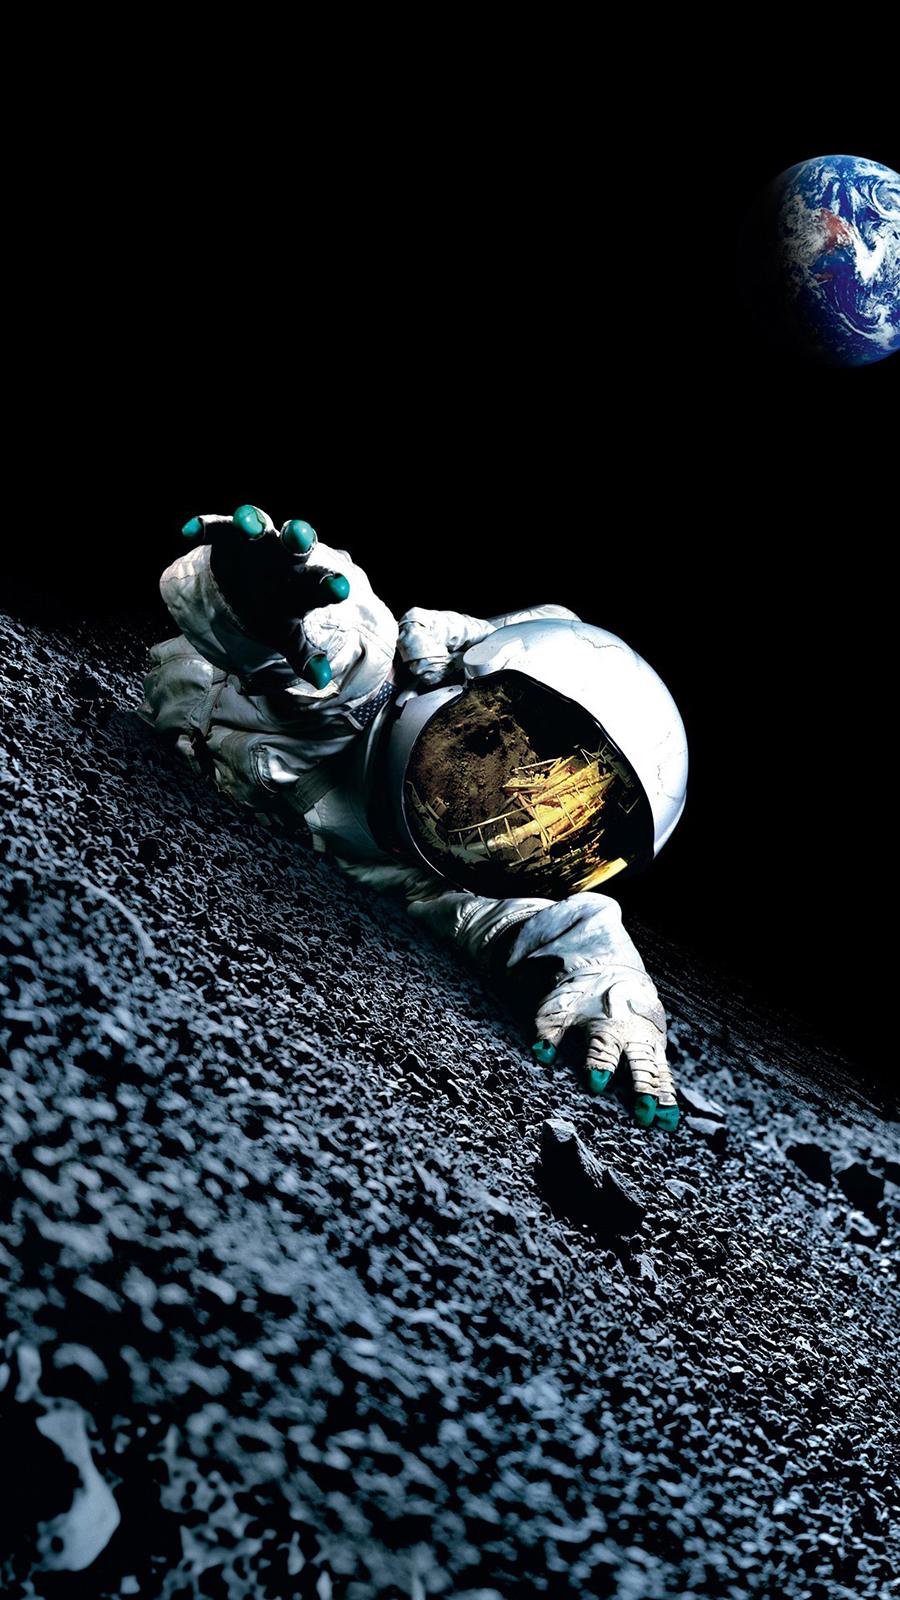 Apollo 18 Moon Astronaut HD Wallpapers Free Donwload